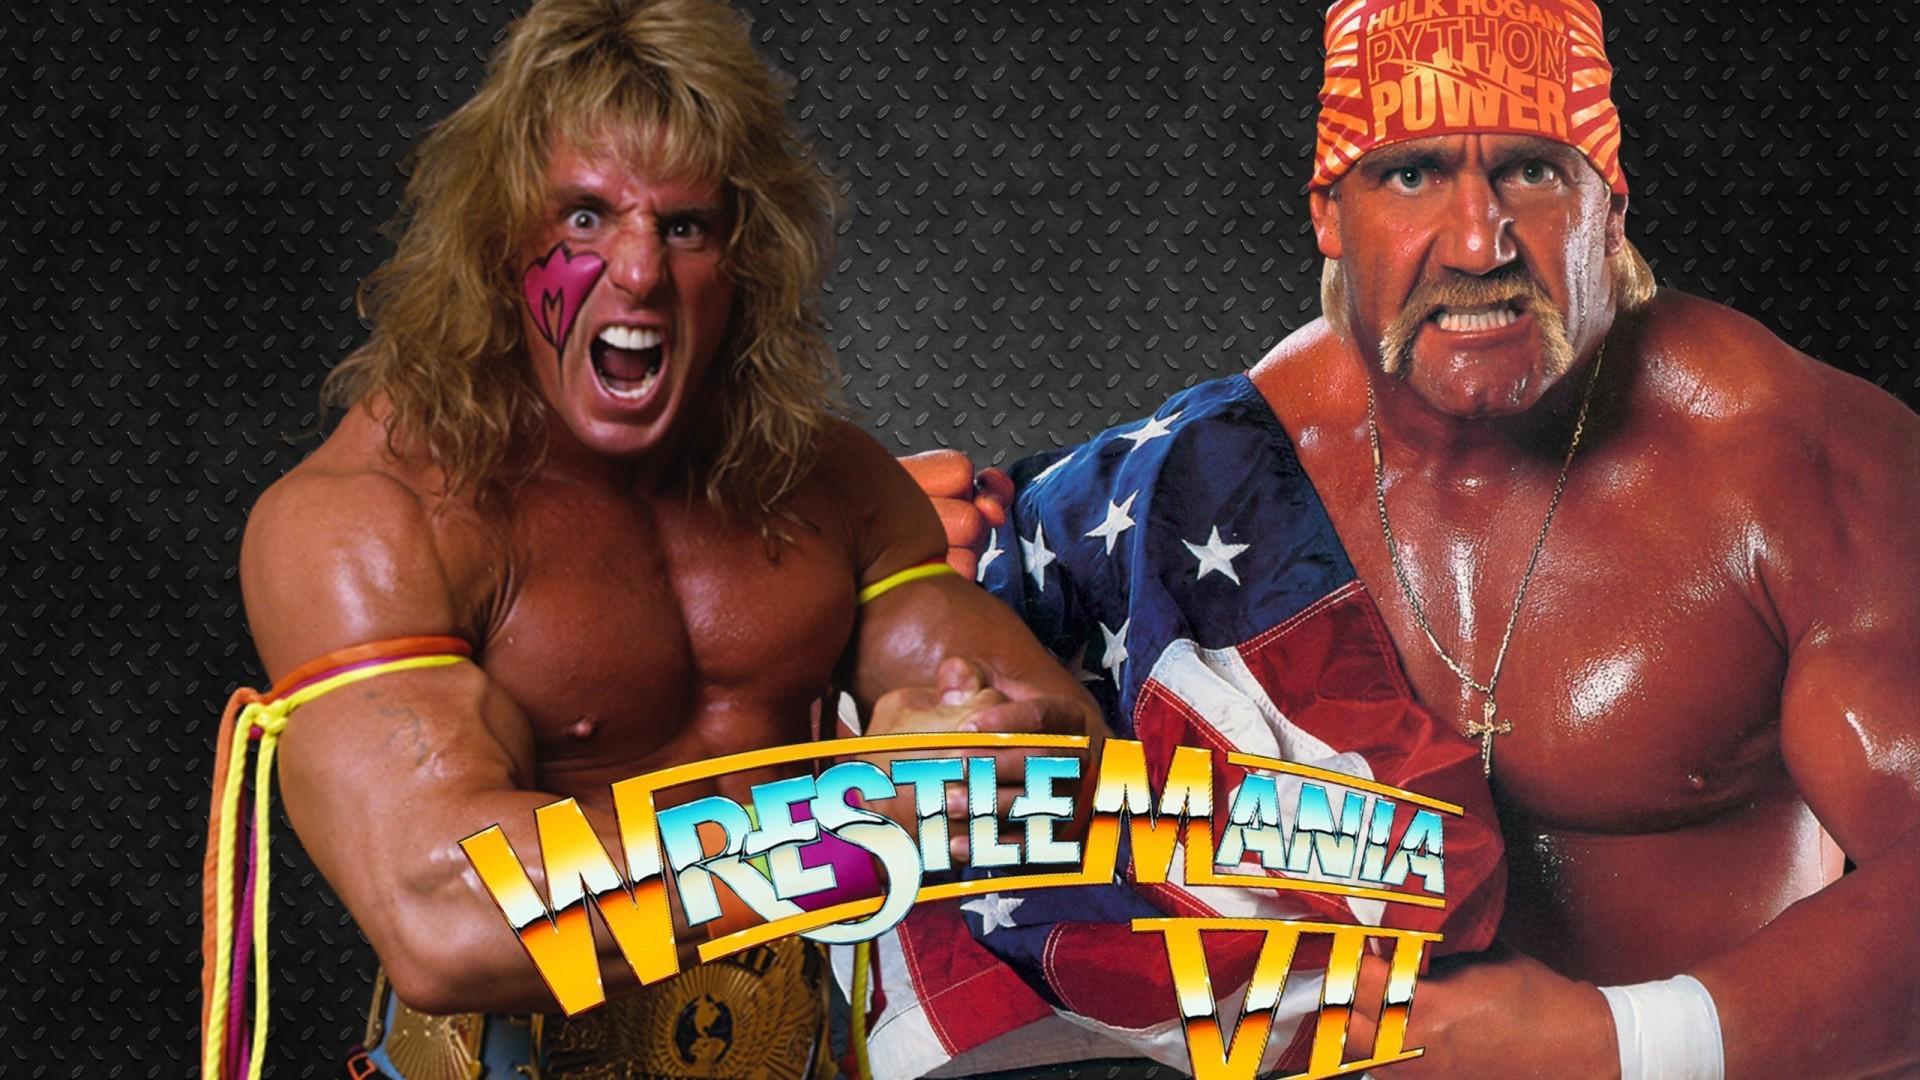 The Ultimate Warrior & Hulk Hogan WrestleMania 7 HD Wallpaper